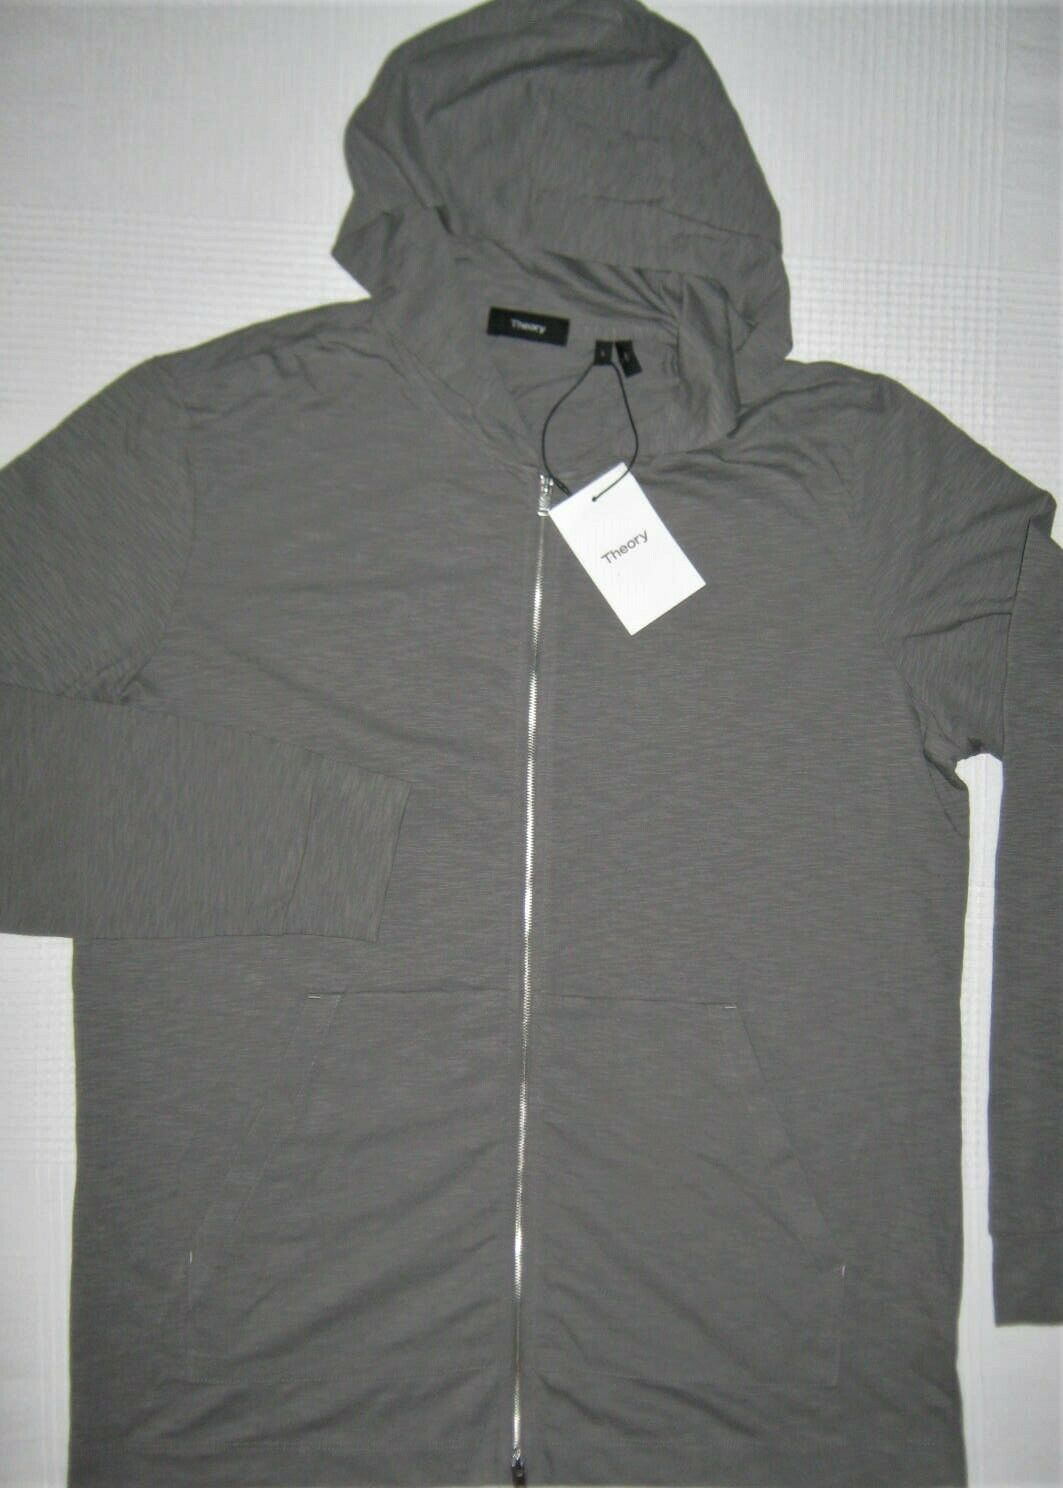 Theory Layer Zip Hooded Sweatshirt Slim-Fit Gray Soft Cotton Jacket Sweater L